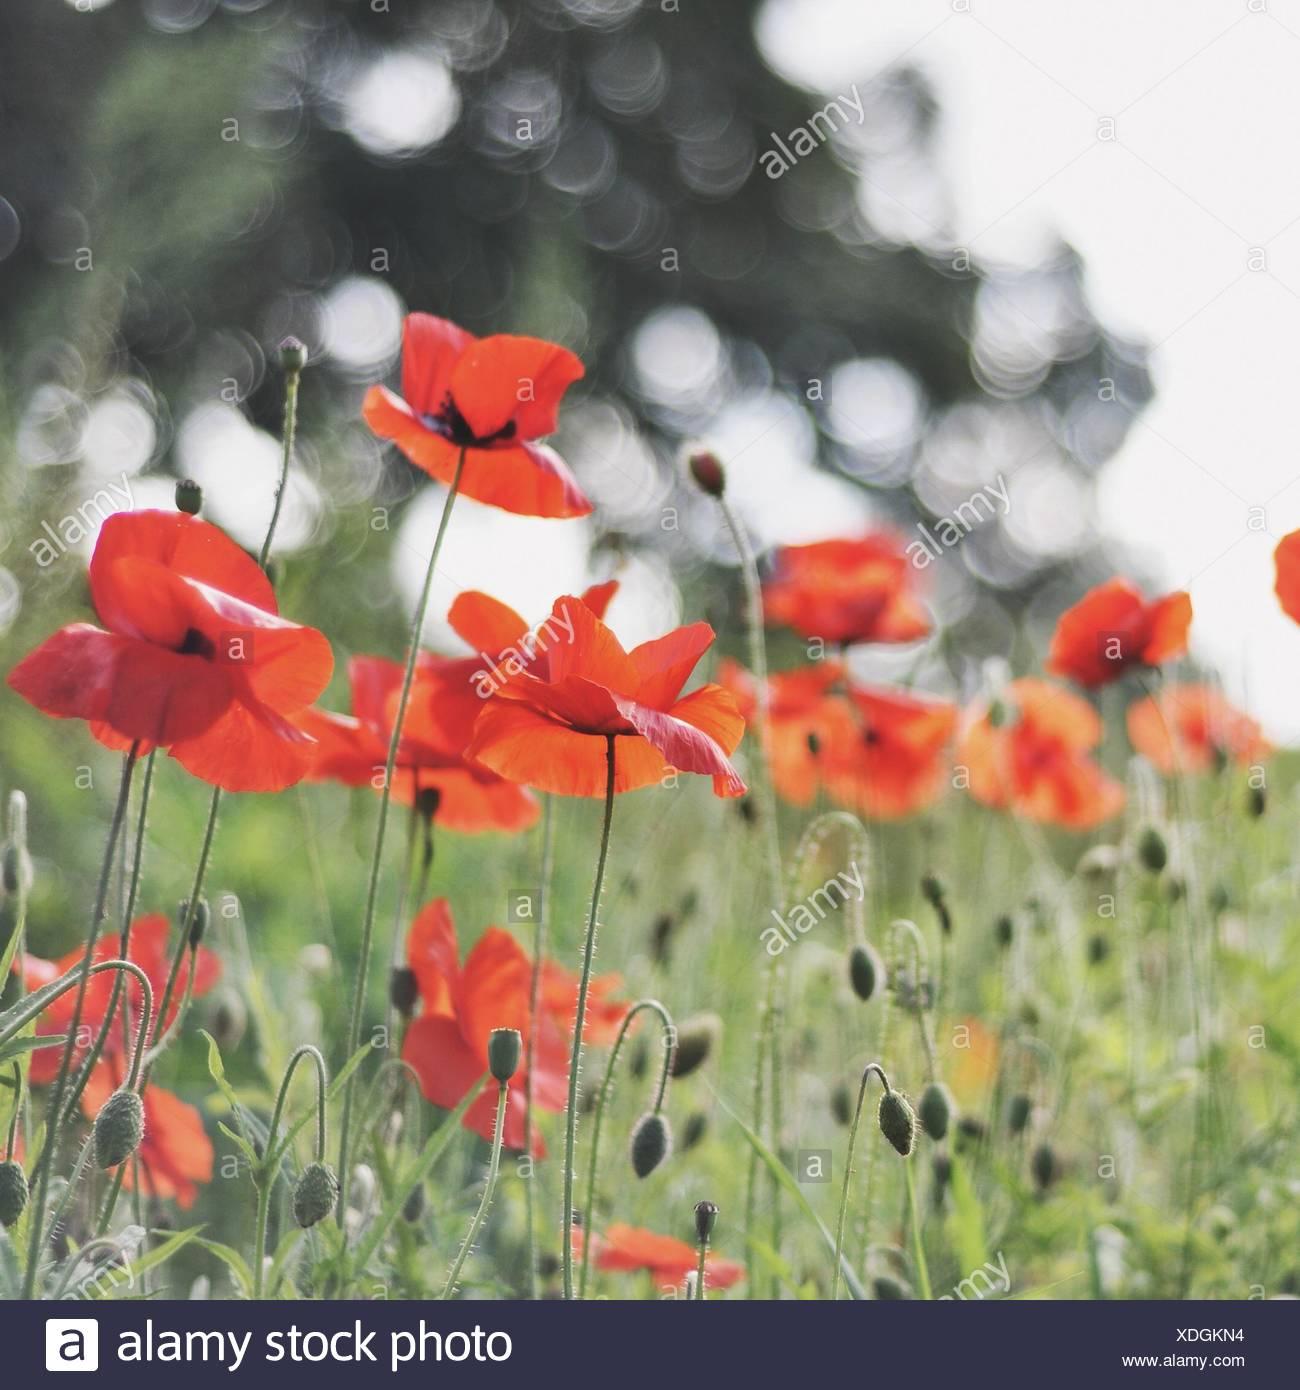 Red Poppy Flowers In A Field England Uk Stock Photo 283723136 Alamy